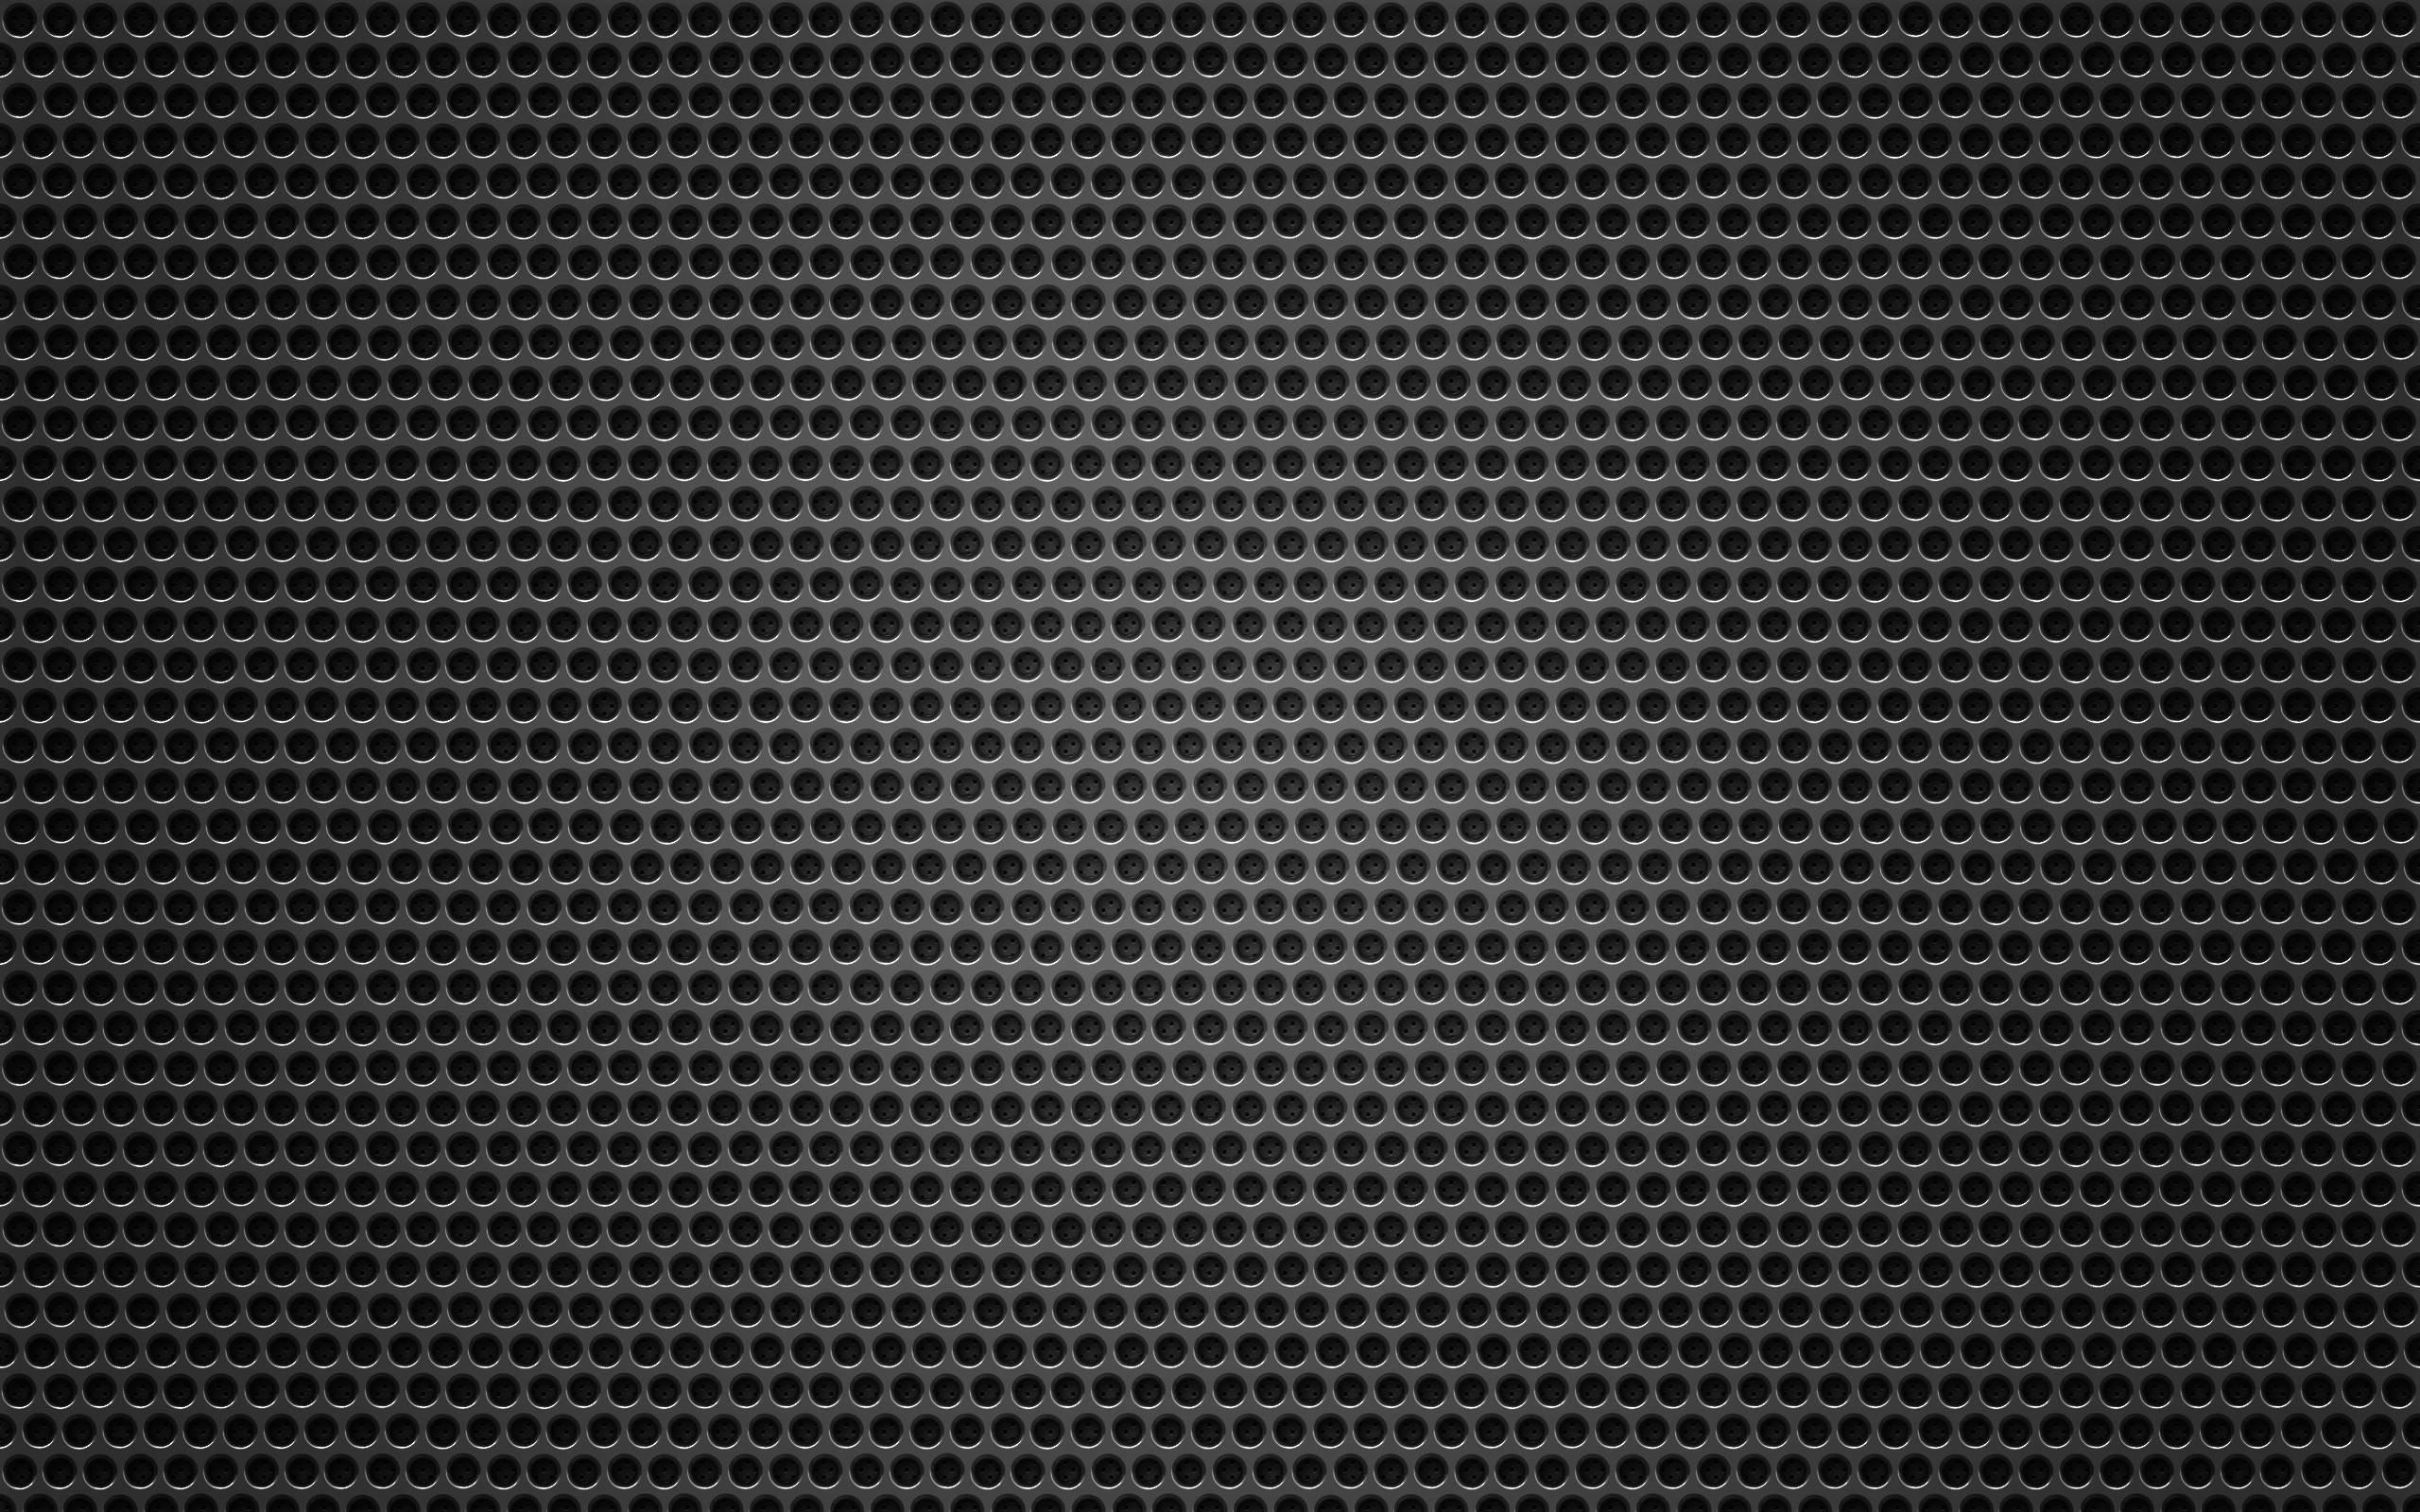 Black Carbon Fiber Hd – Viewing Gallery